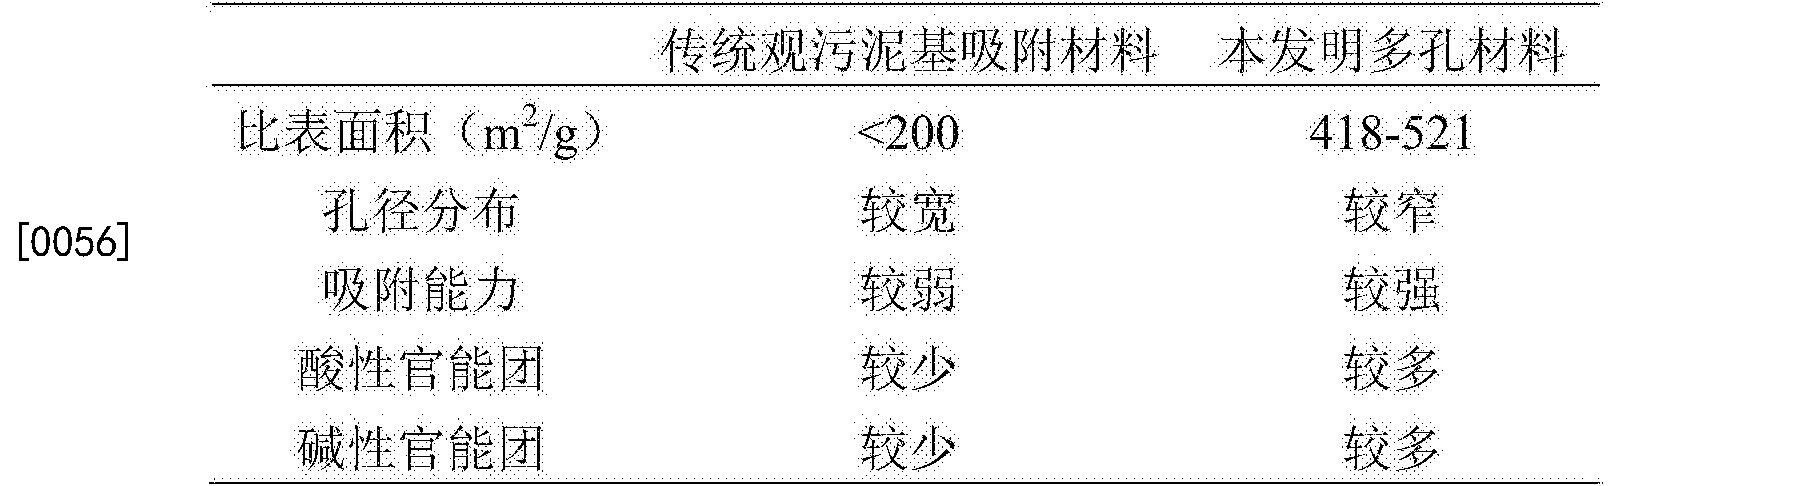 Figure CN106966392AD00062